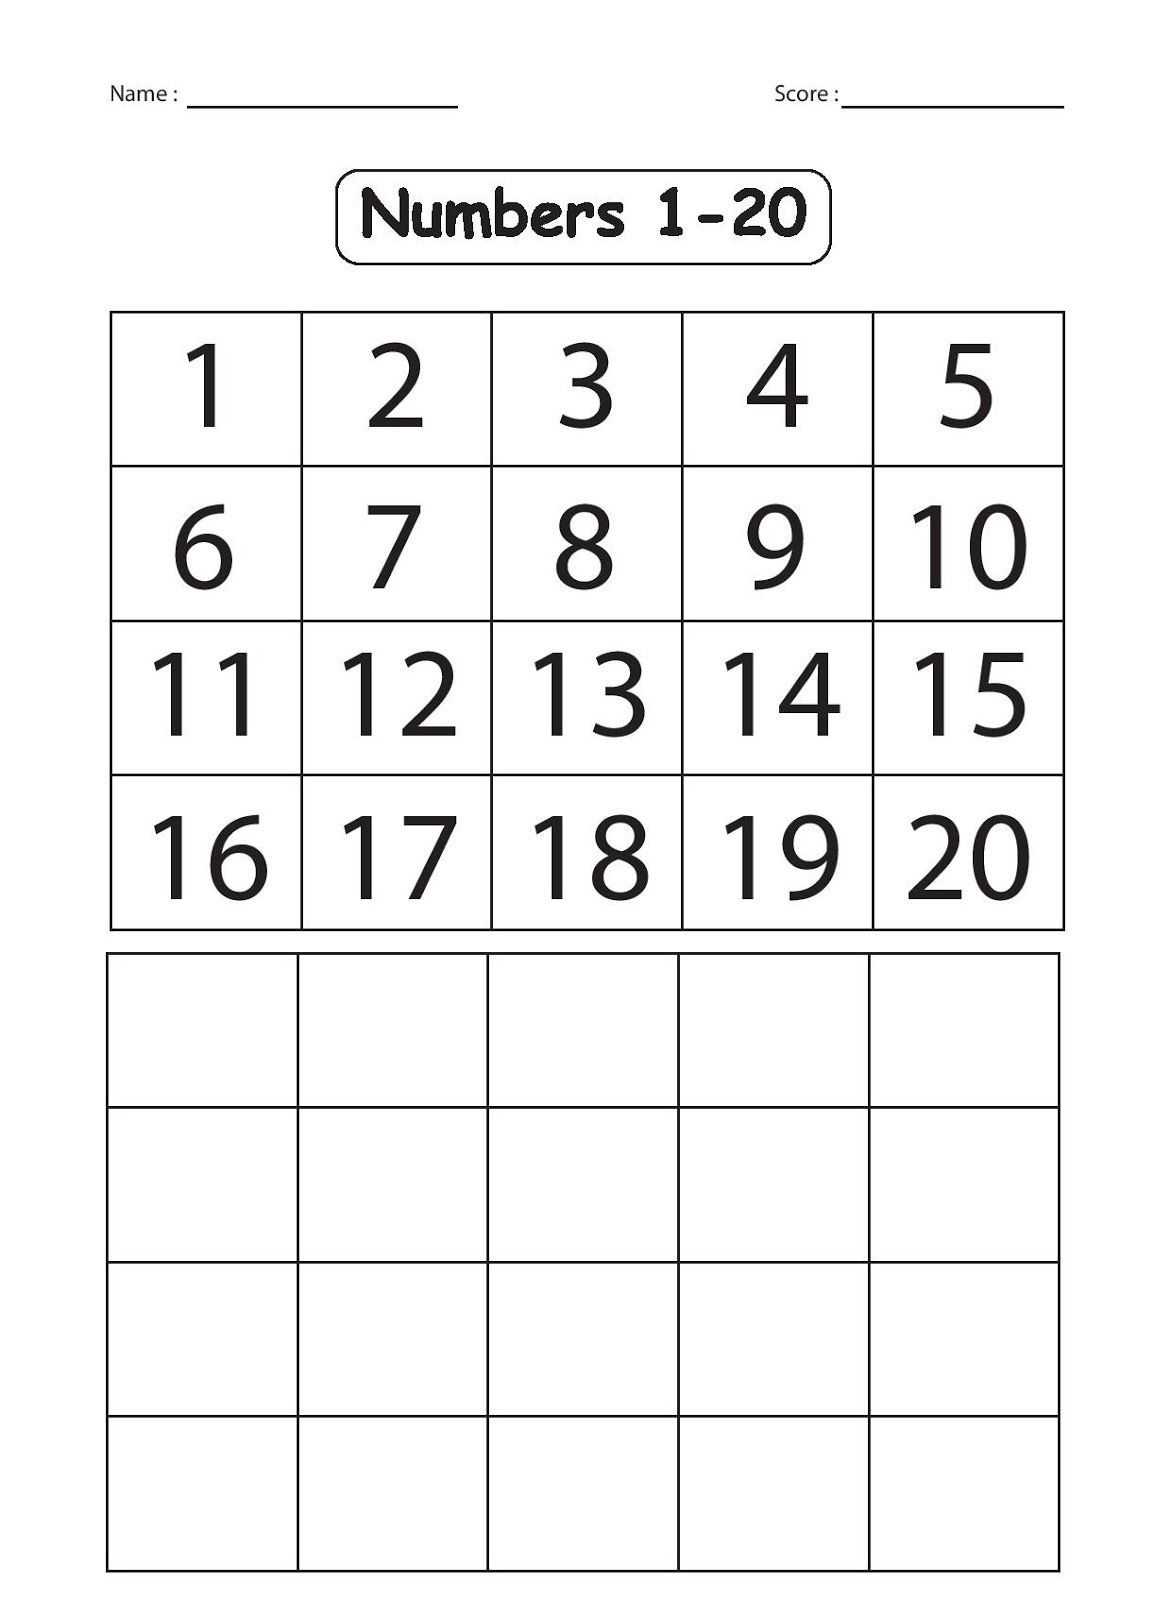 Http 2 Bp Blogspot Com No66ag0ejeq Vmfcds27ngi Aaaaaaaabdi Tivvlmc3ag Number Worksheets Kindergarten Number Writing Worksheets Number Recognition Worksheets [ 1600 x 1171 Pixel ]